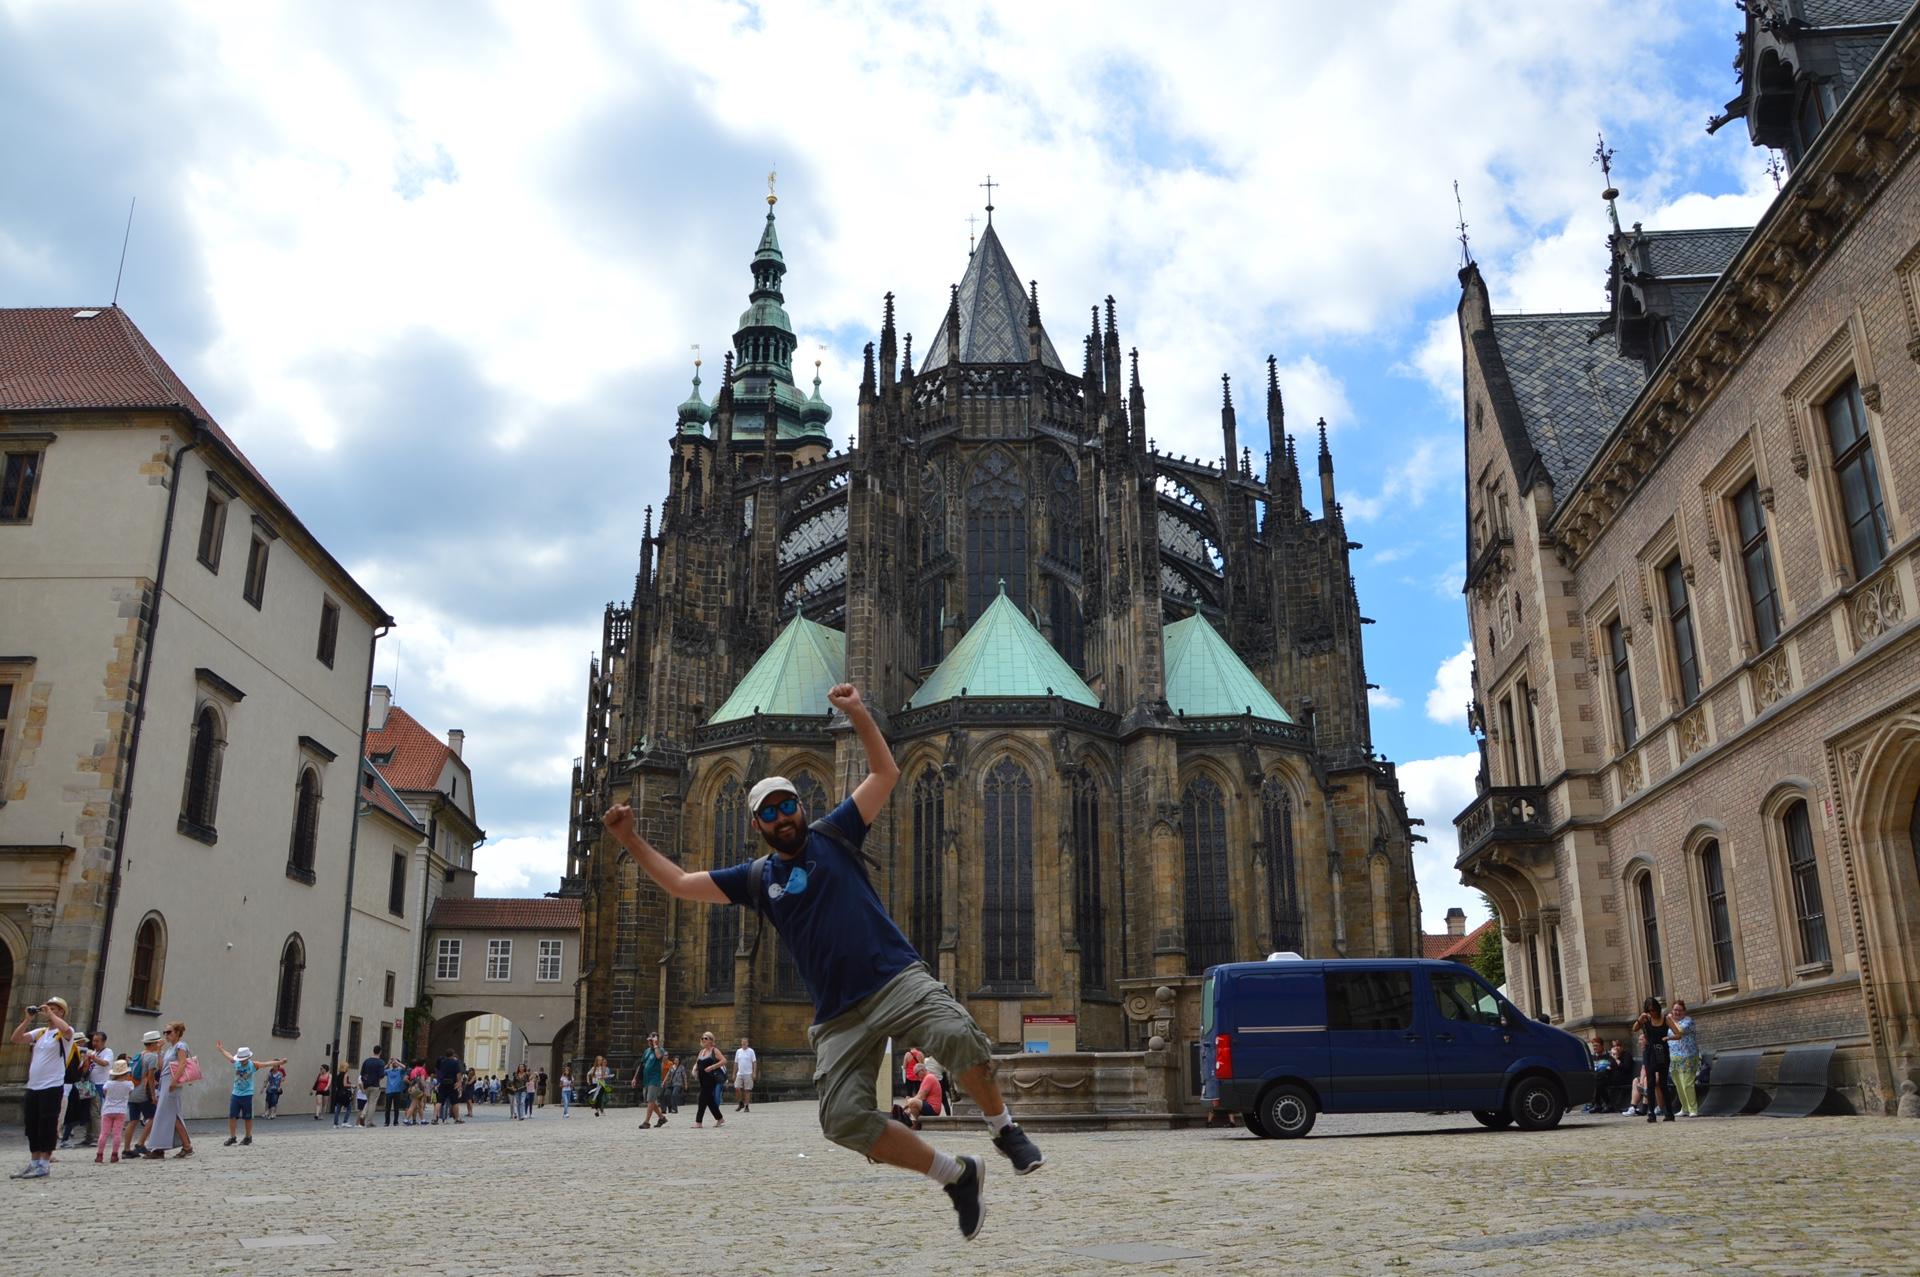 Vista de la Catedral de Praga